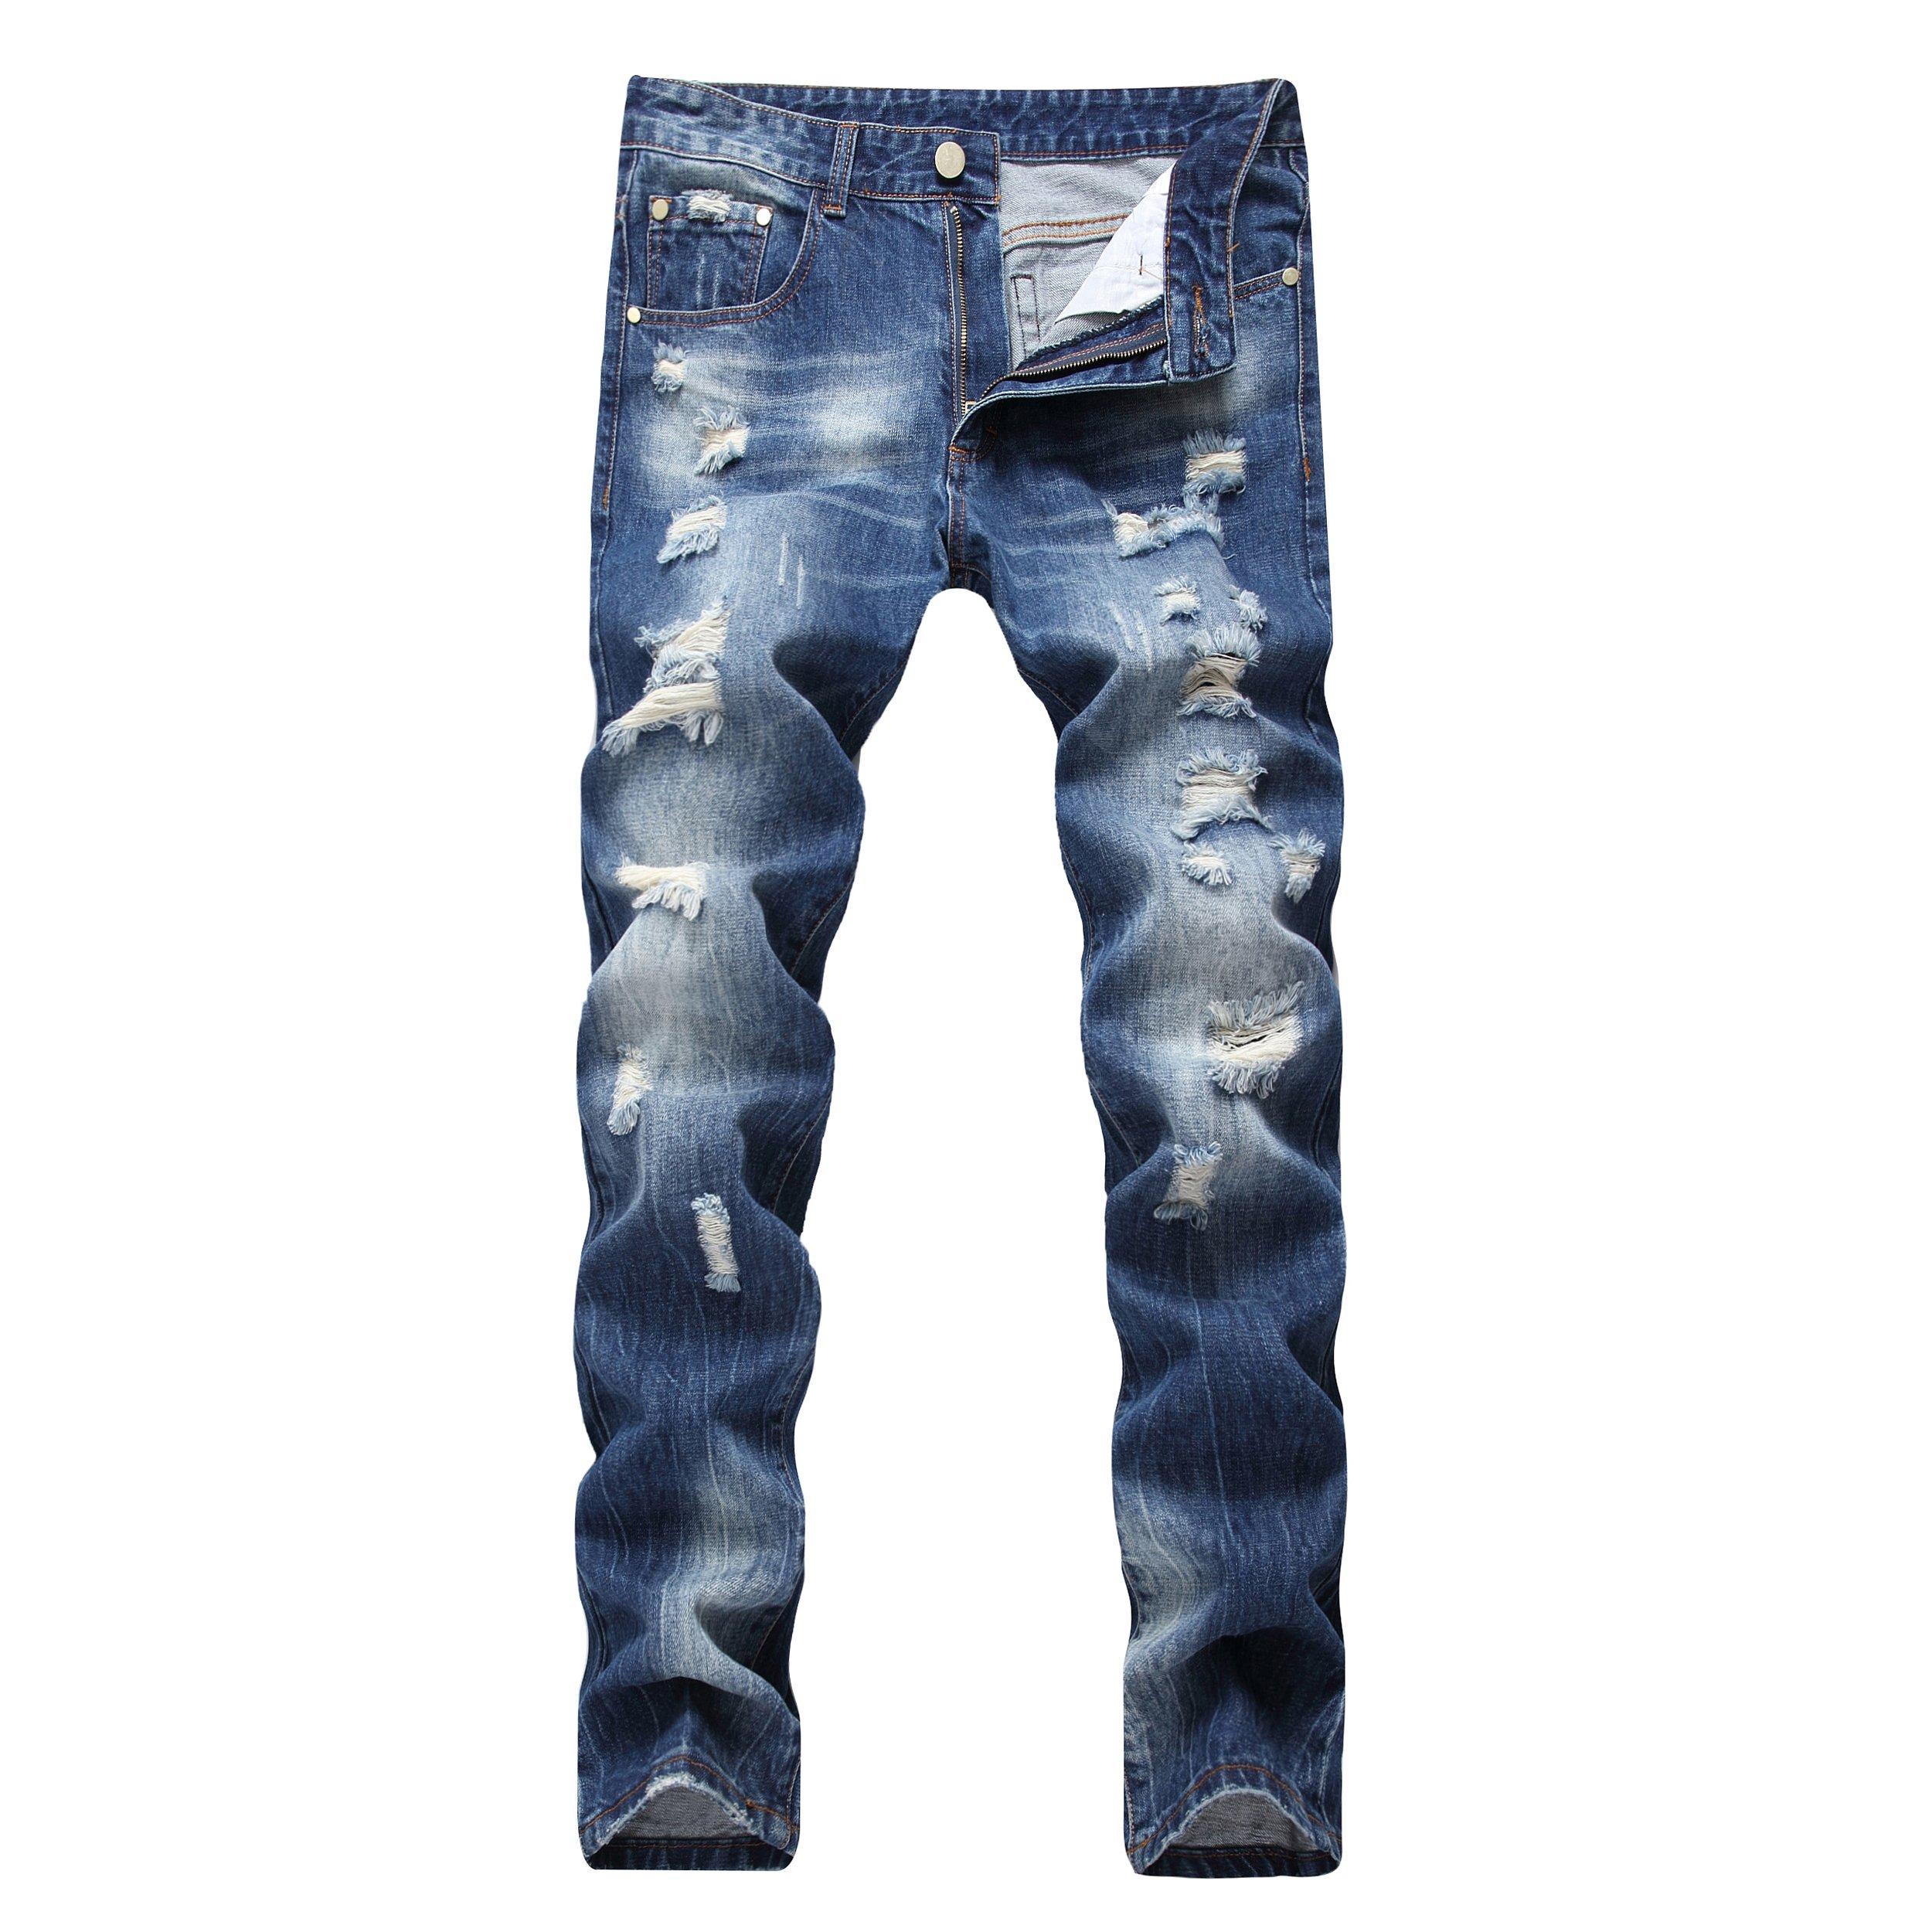 DAVID.ANN Men's Straight Fit Distressed Ripped Denim Jeans,Blue,32